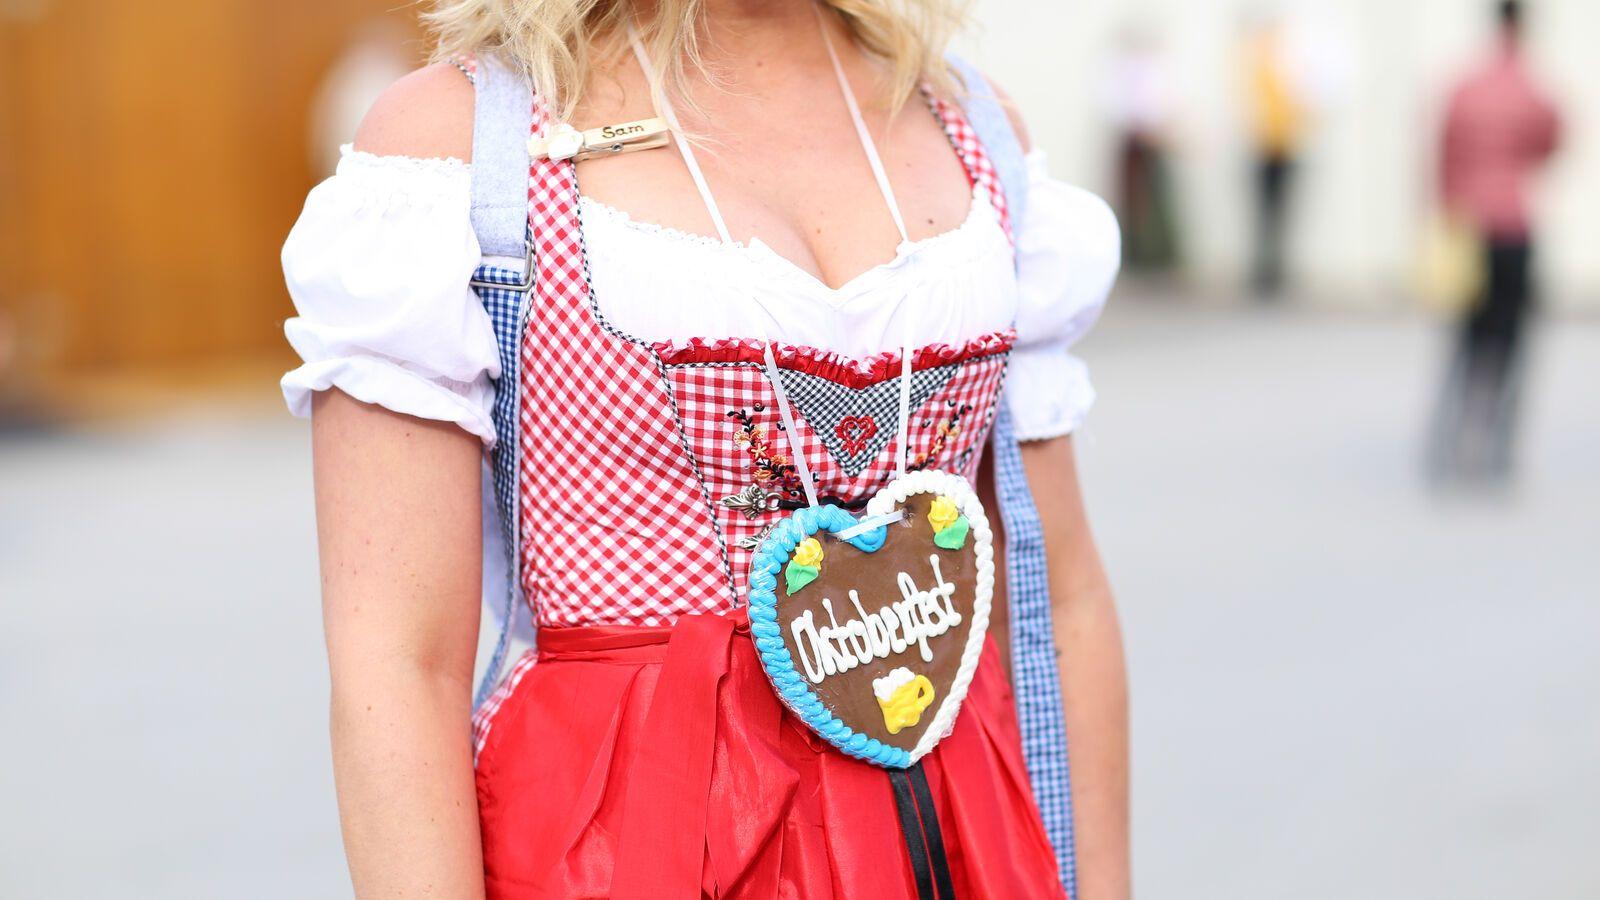 Oktoberfest: Dieses Dekolleté ist 2019 besonders beliebt